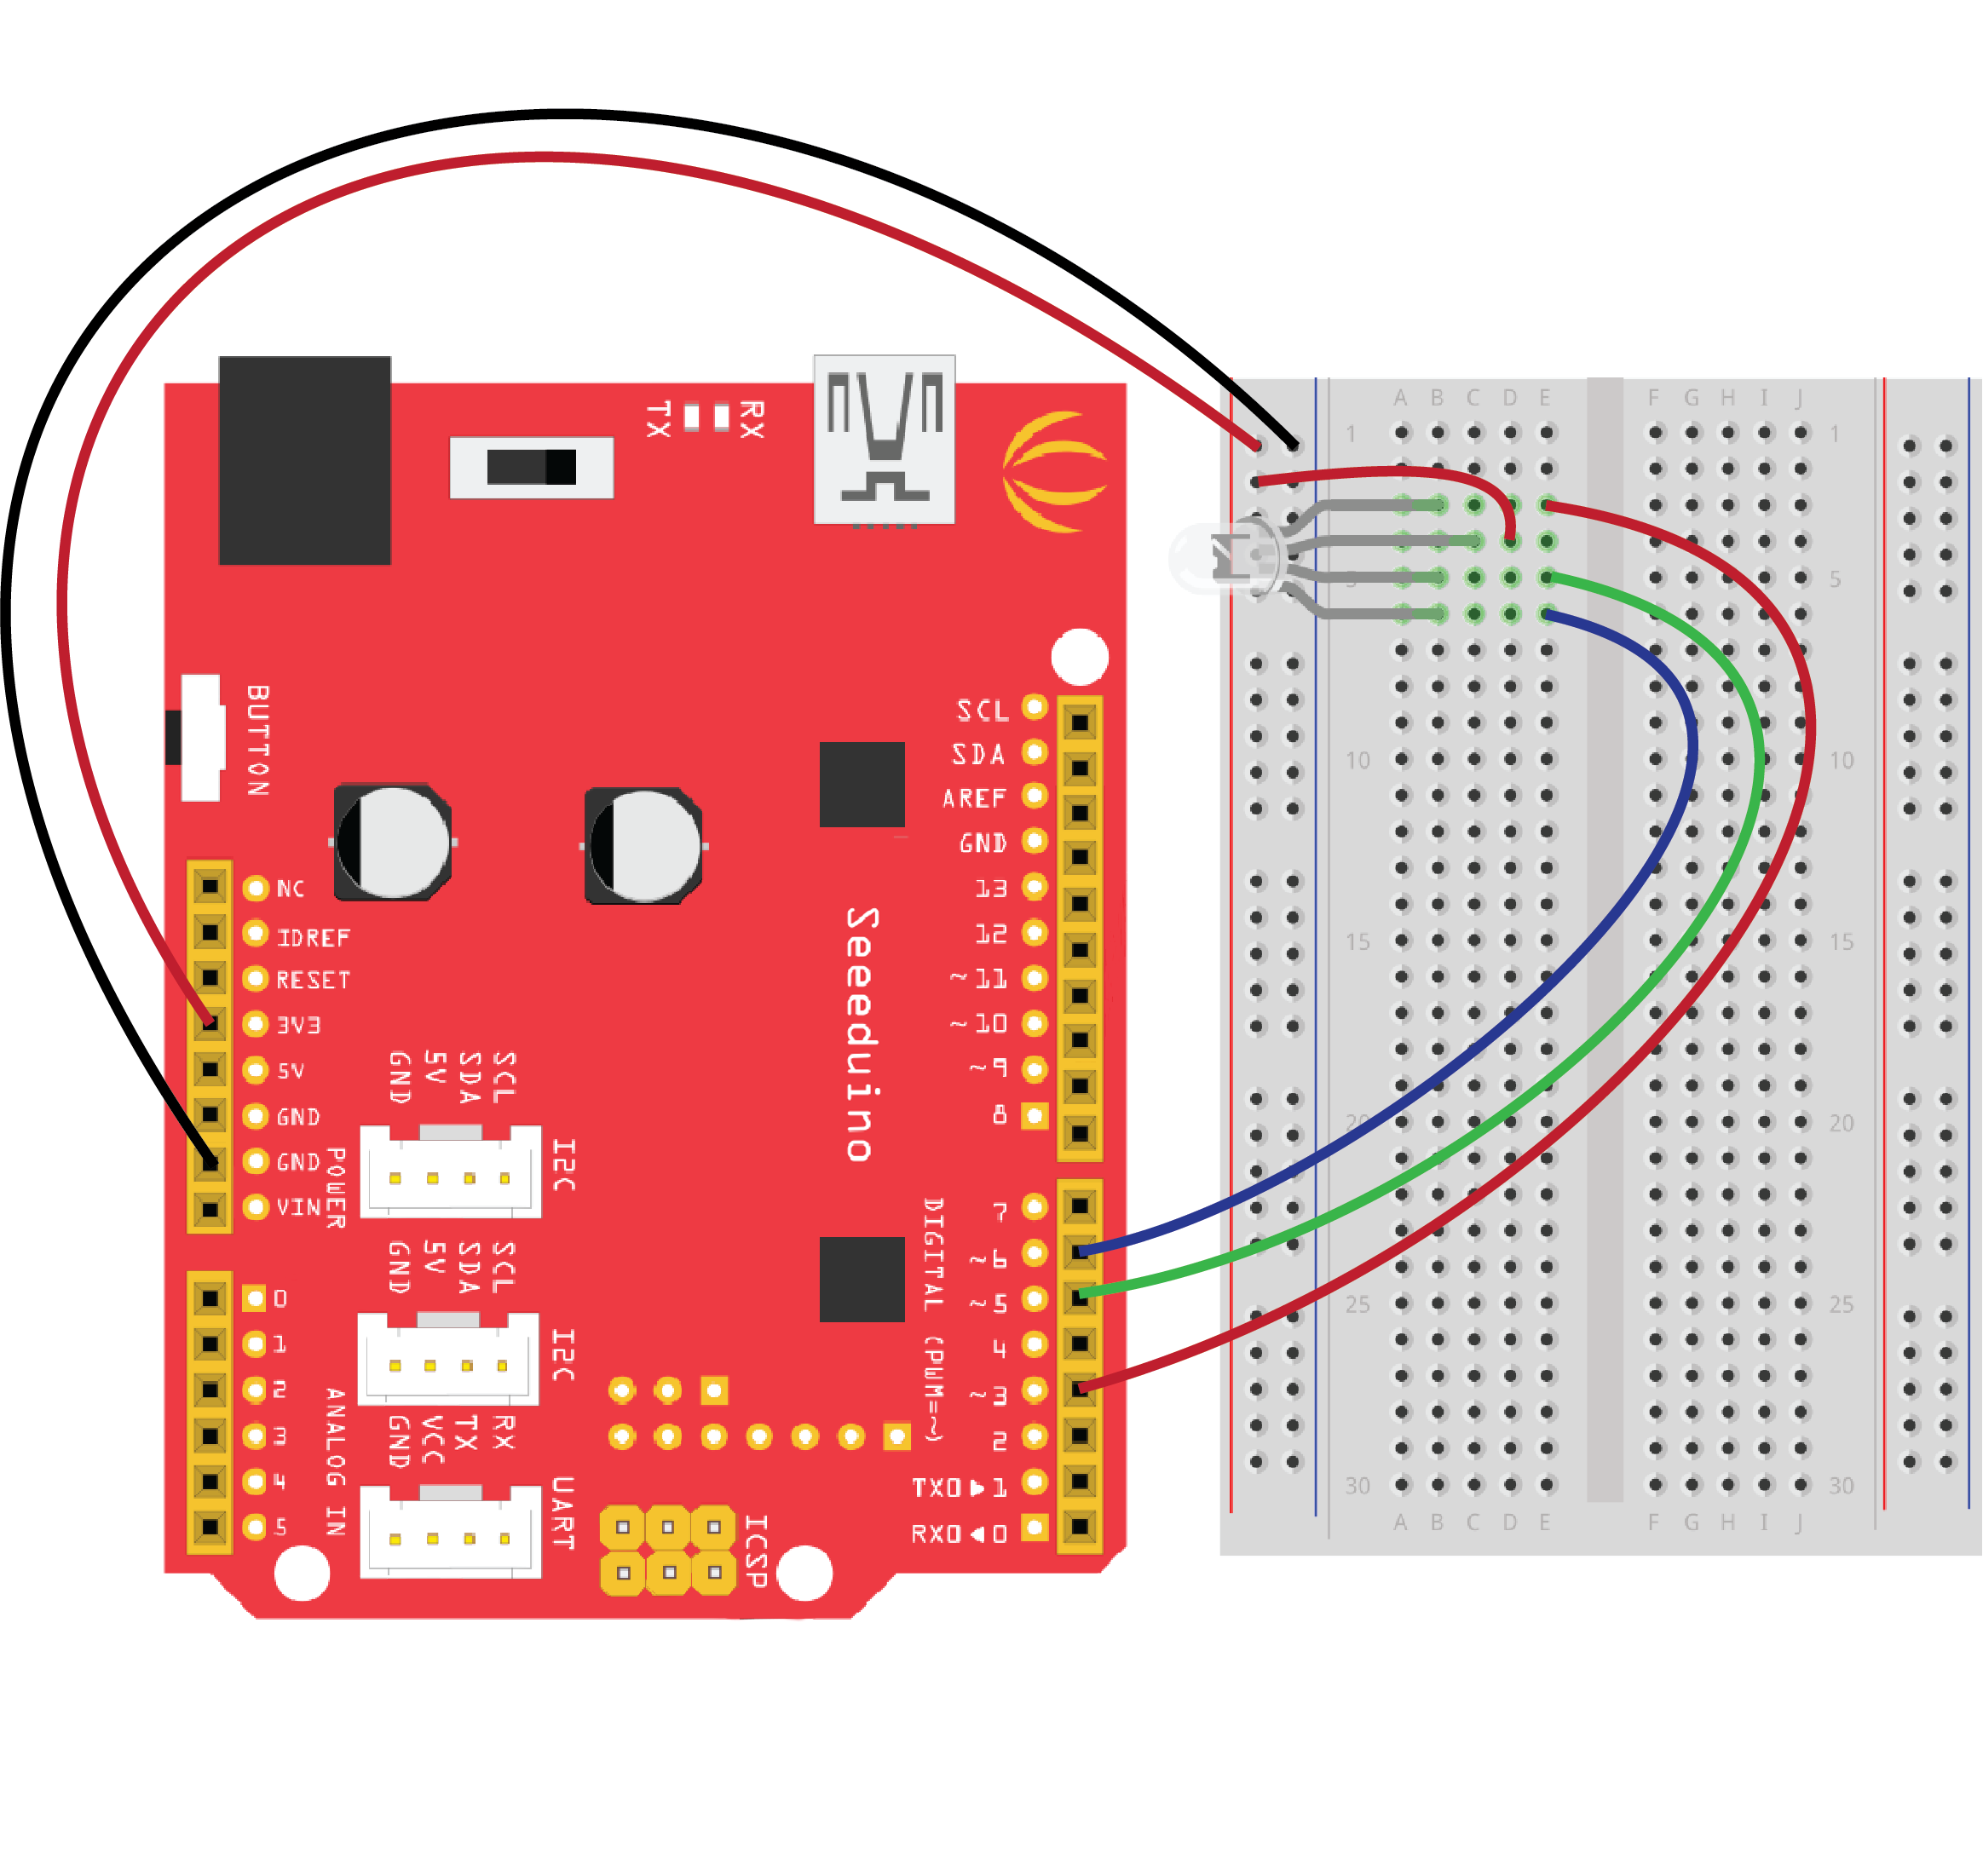 Rgb Led Circuit Diagram Pic16f628 4 Pwm Controller Semifluidcom 2327x2202